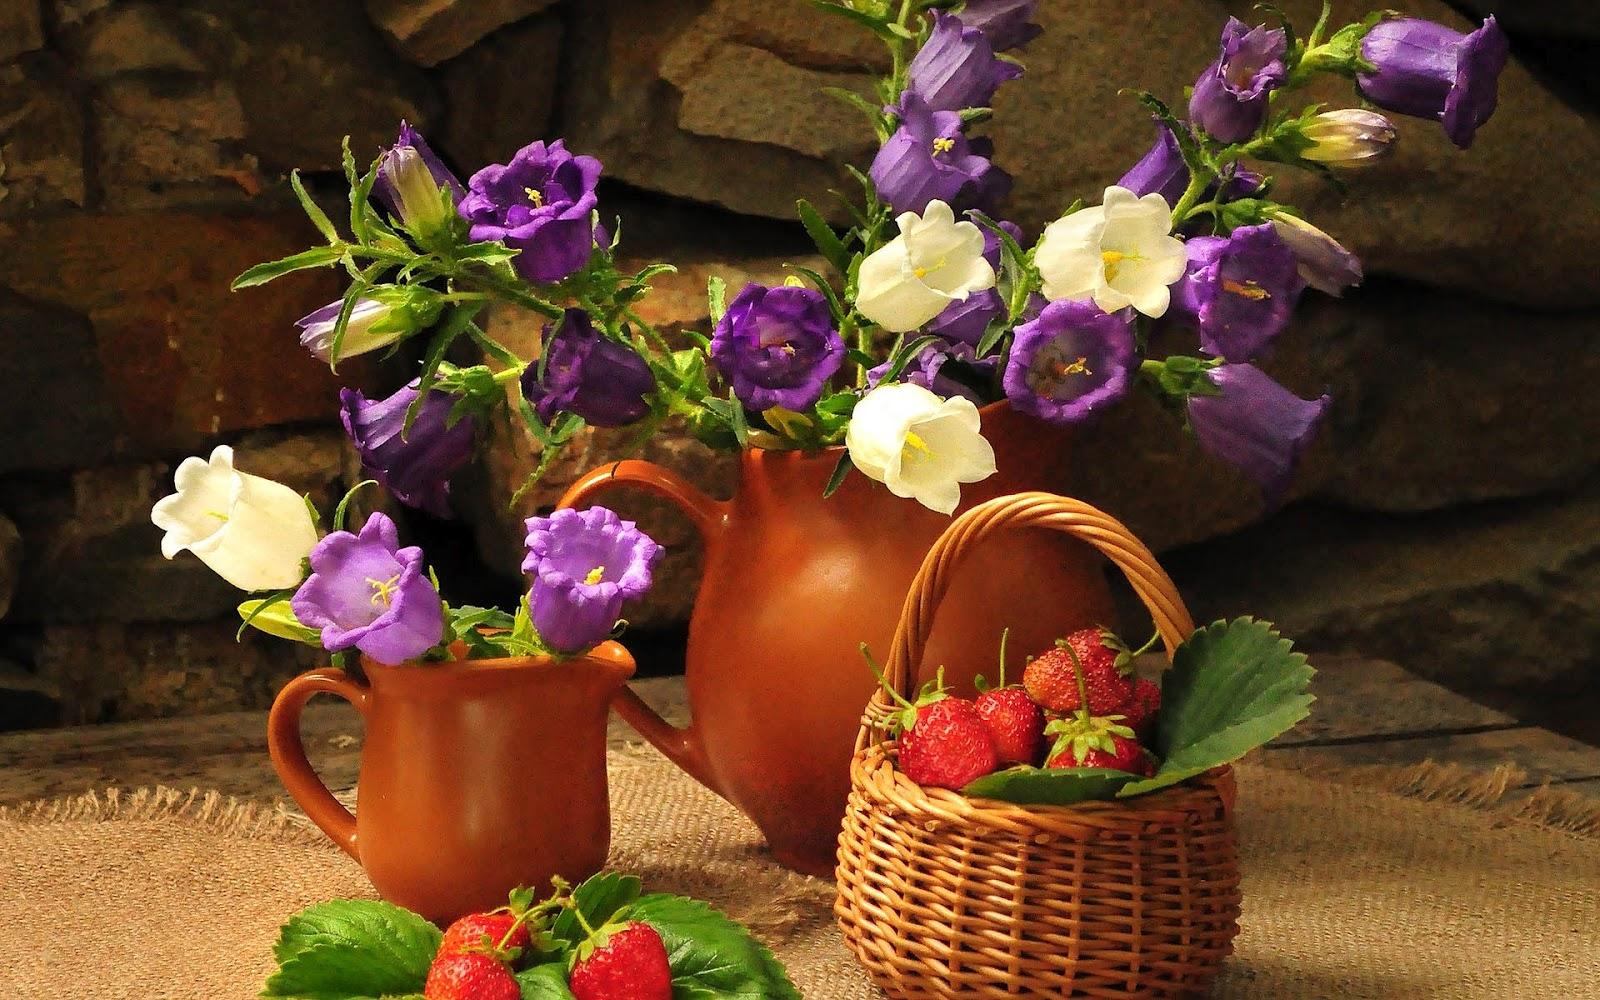 http://3.bp.blogspot.com/-YJ5AAi_XLbI/UEz0Jh8AjtI/AAAAAAAAHJ0/EC6wAlAfRF8/s1600/hd-bloemen-wallpaper-met-paarse-en-witte-bloemen-en-een-mand-vol-aardbeien-achtergrond-foto.jpg